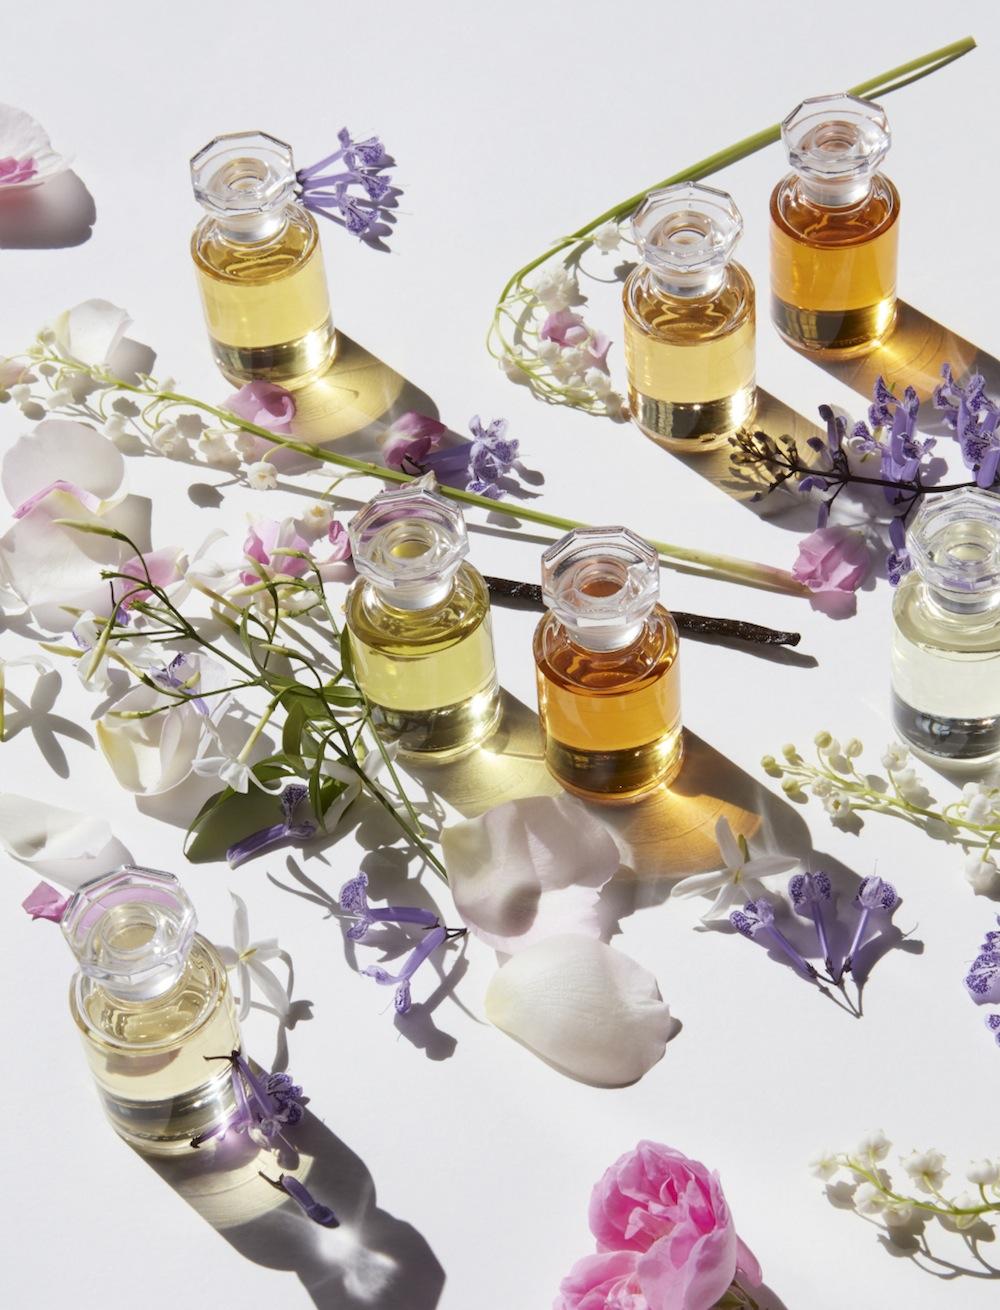 Apog 233 E Louis Vuitton Perfume A New Fragrance For Women 2016